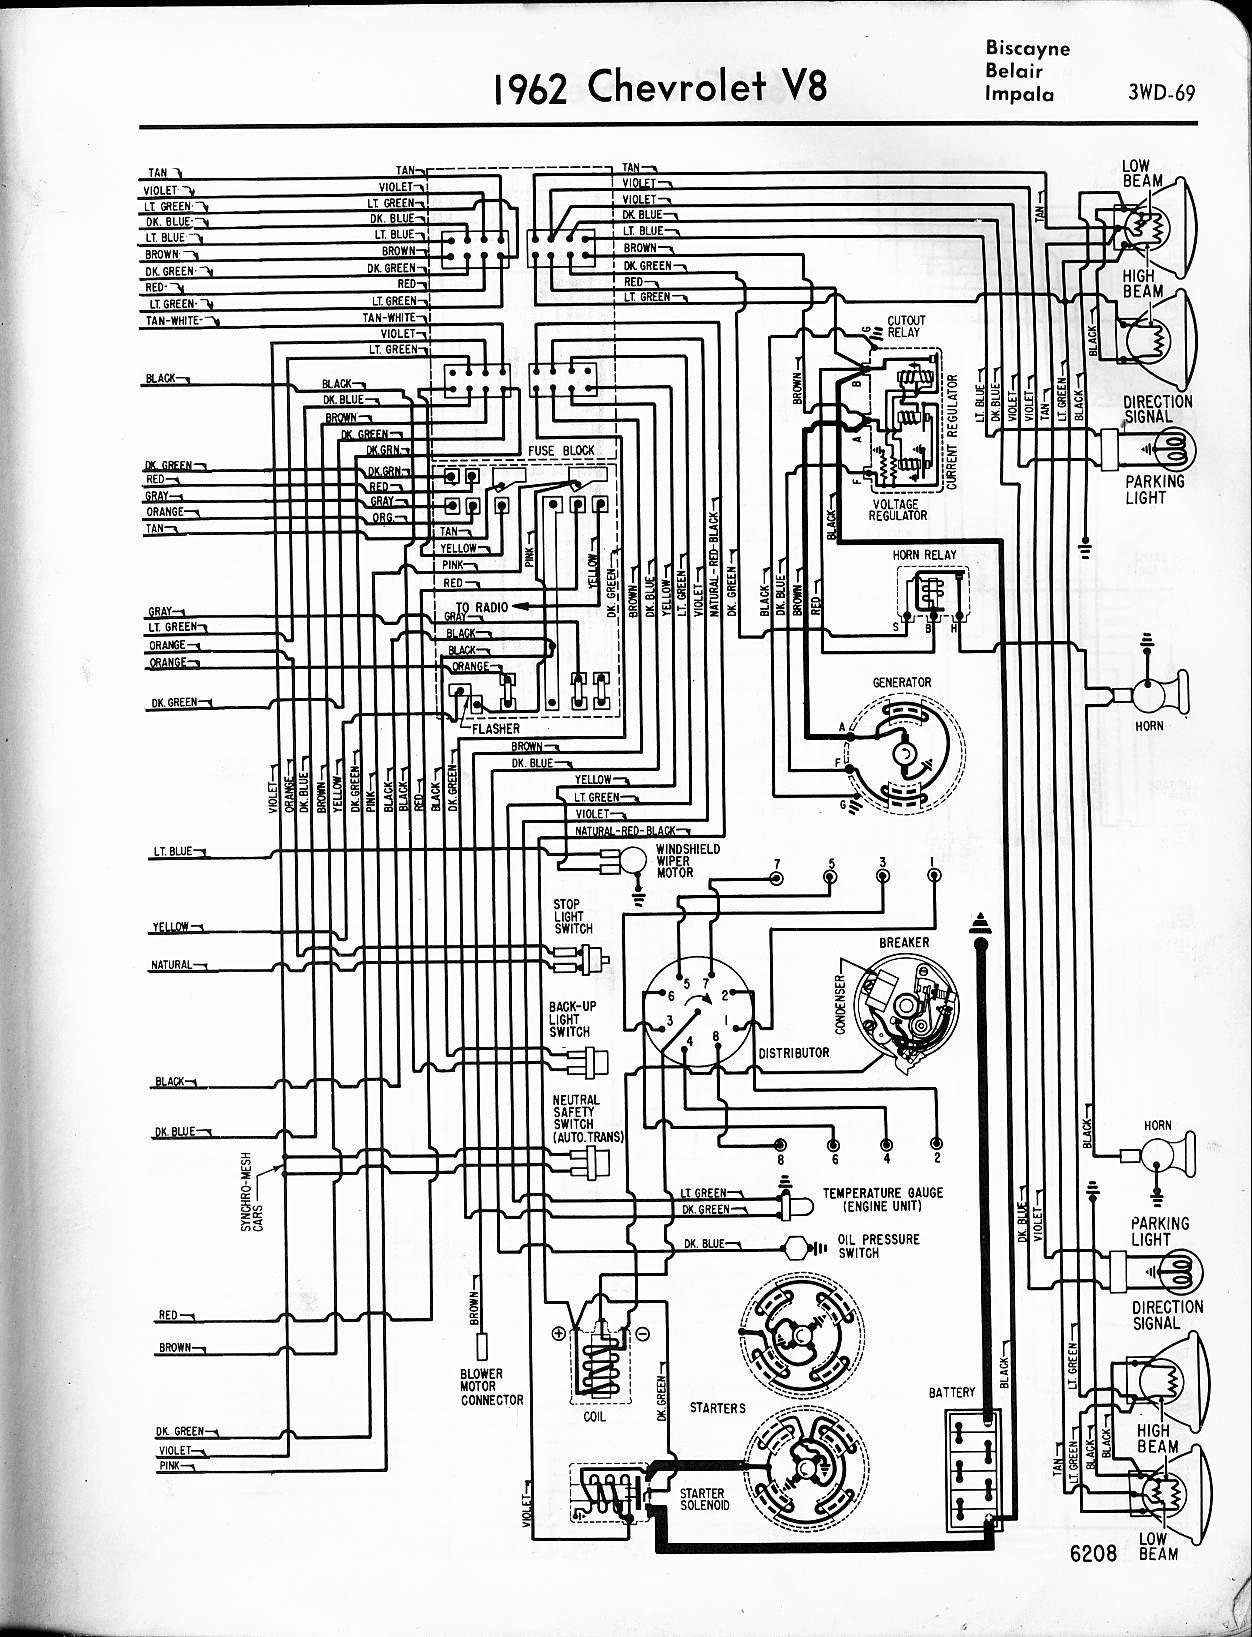 Stupendous 1966 Chevy Wiring Diagrams Automotive Basic Electronics Wiring Diagram Wiring Cloud Staixaidewilluminateatxorg